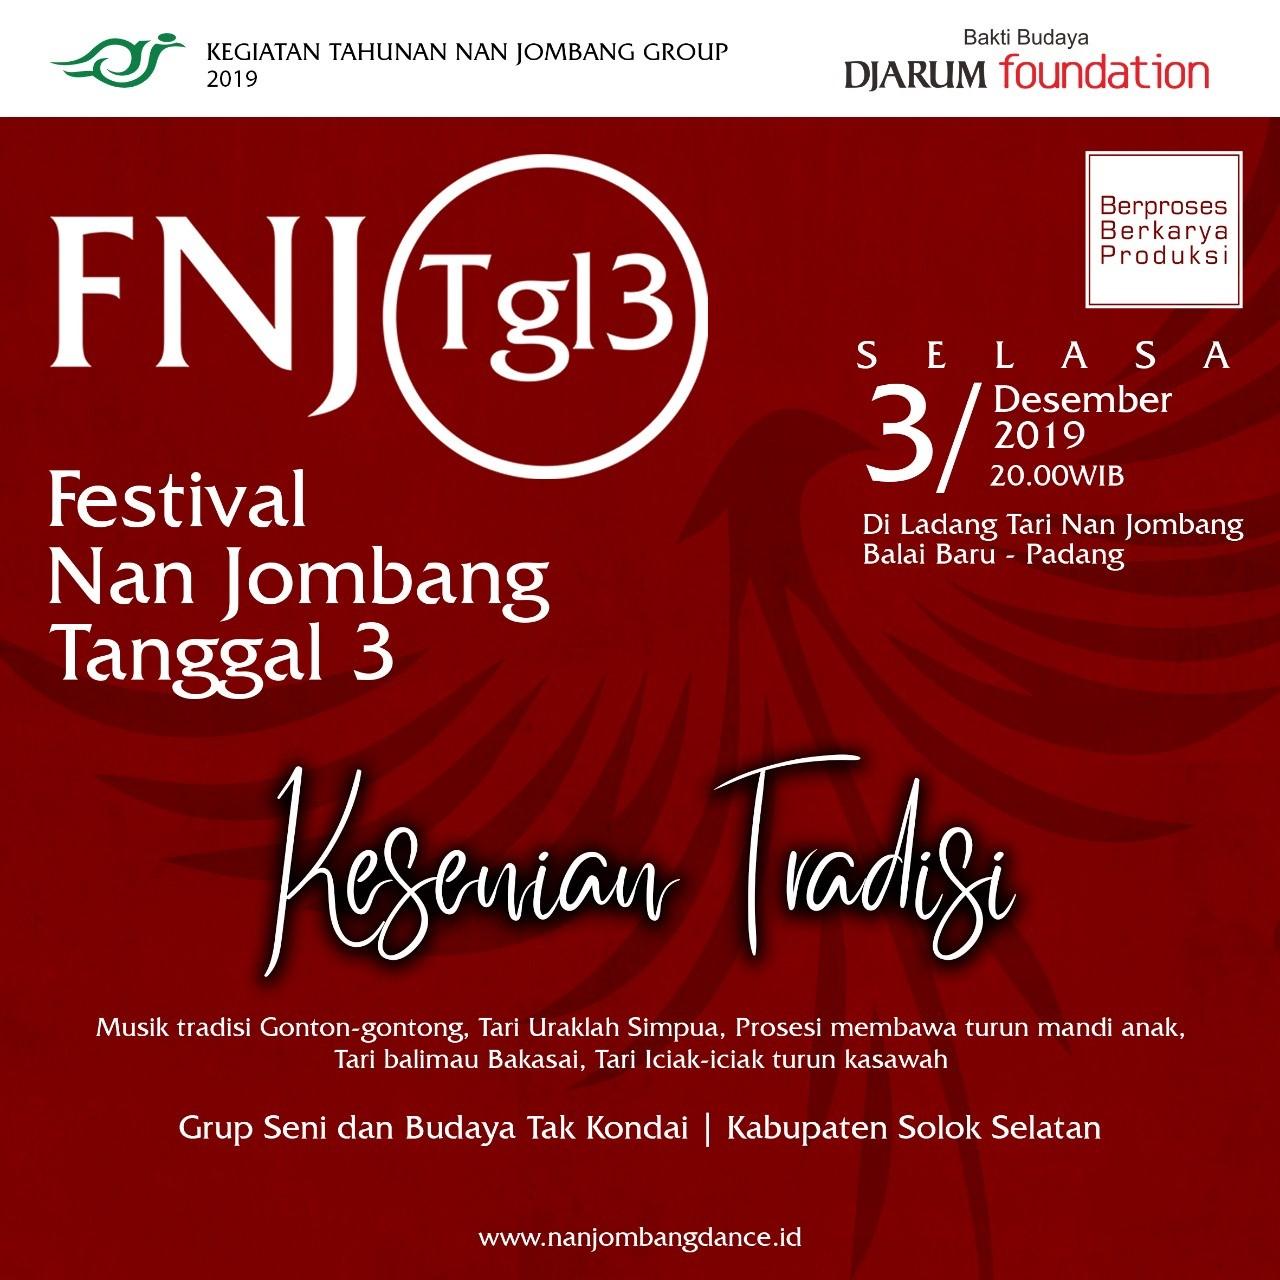 Pertunjukan Grup Seni dan Budaya Tak Kondai di Festival Nan Jombang